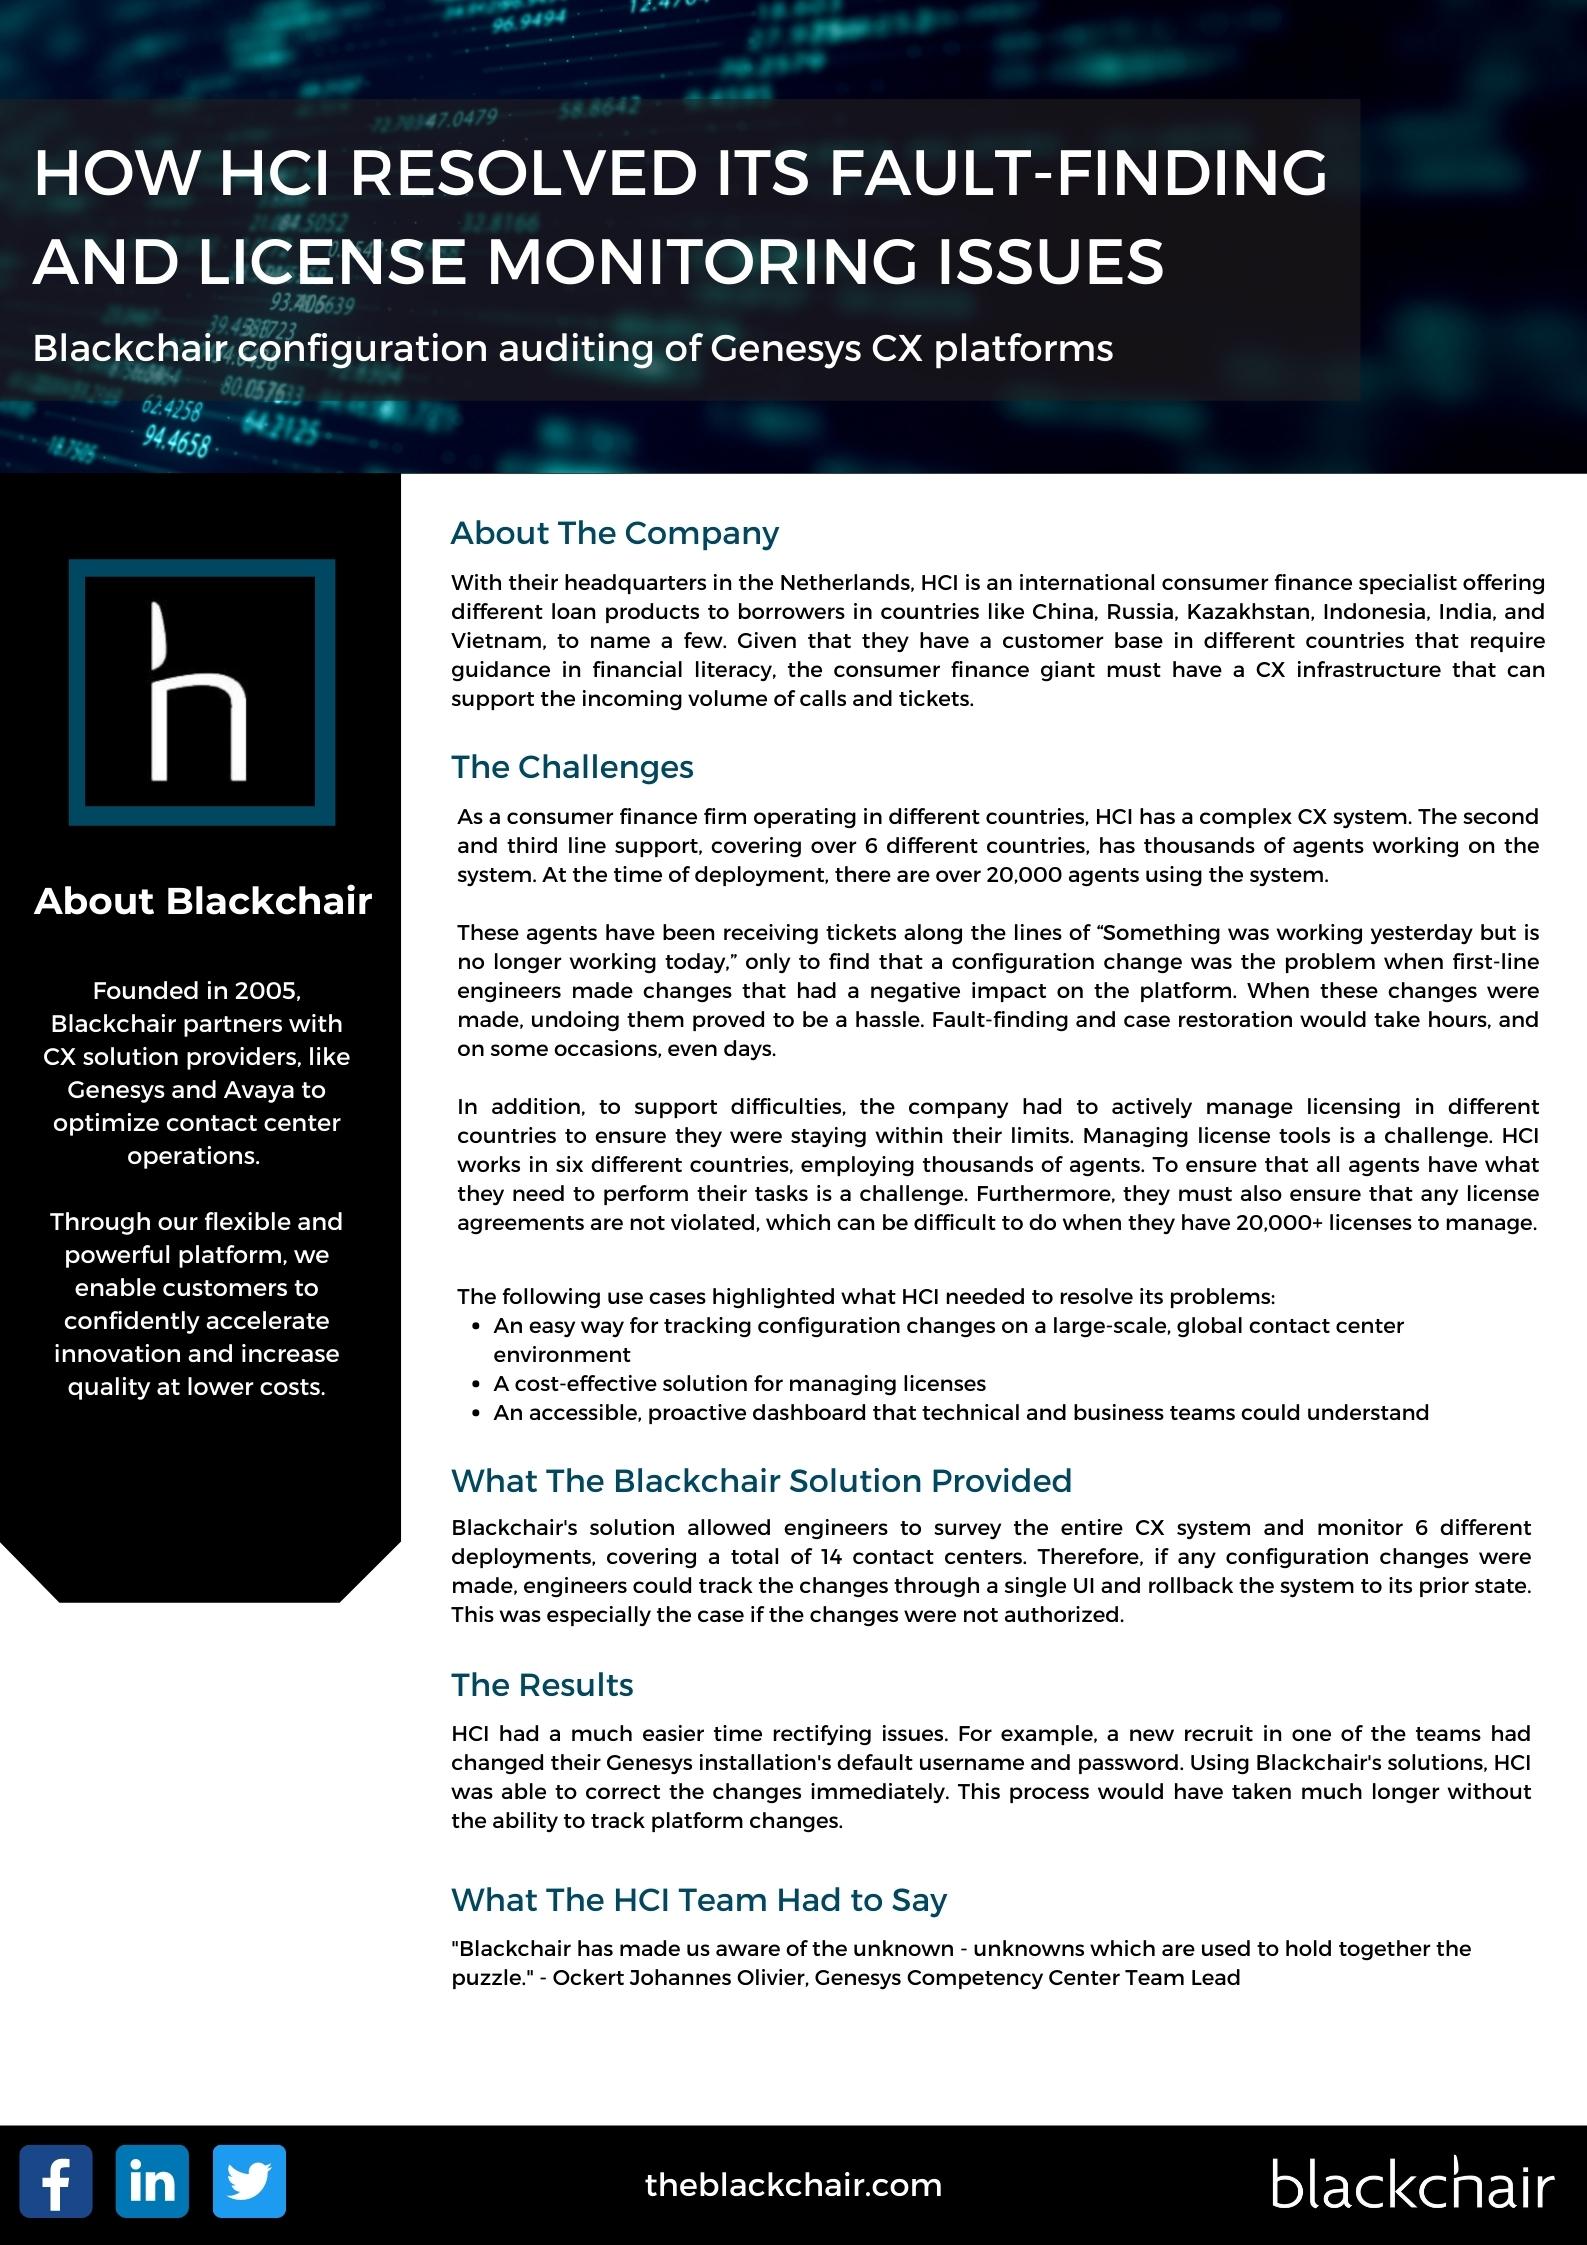 Blackchair - Case Study - HCI Case study